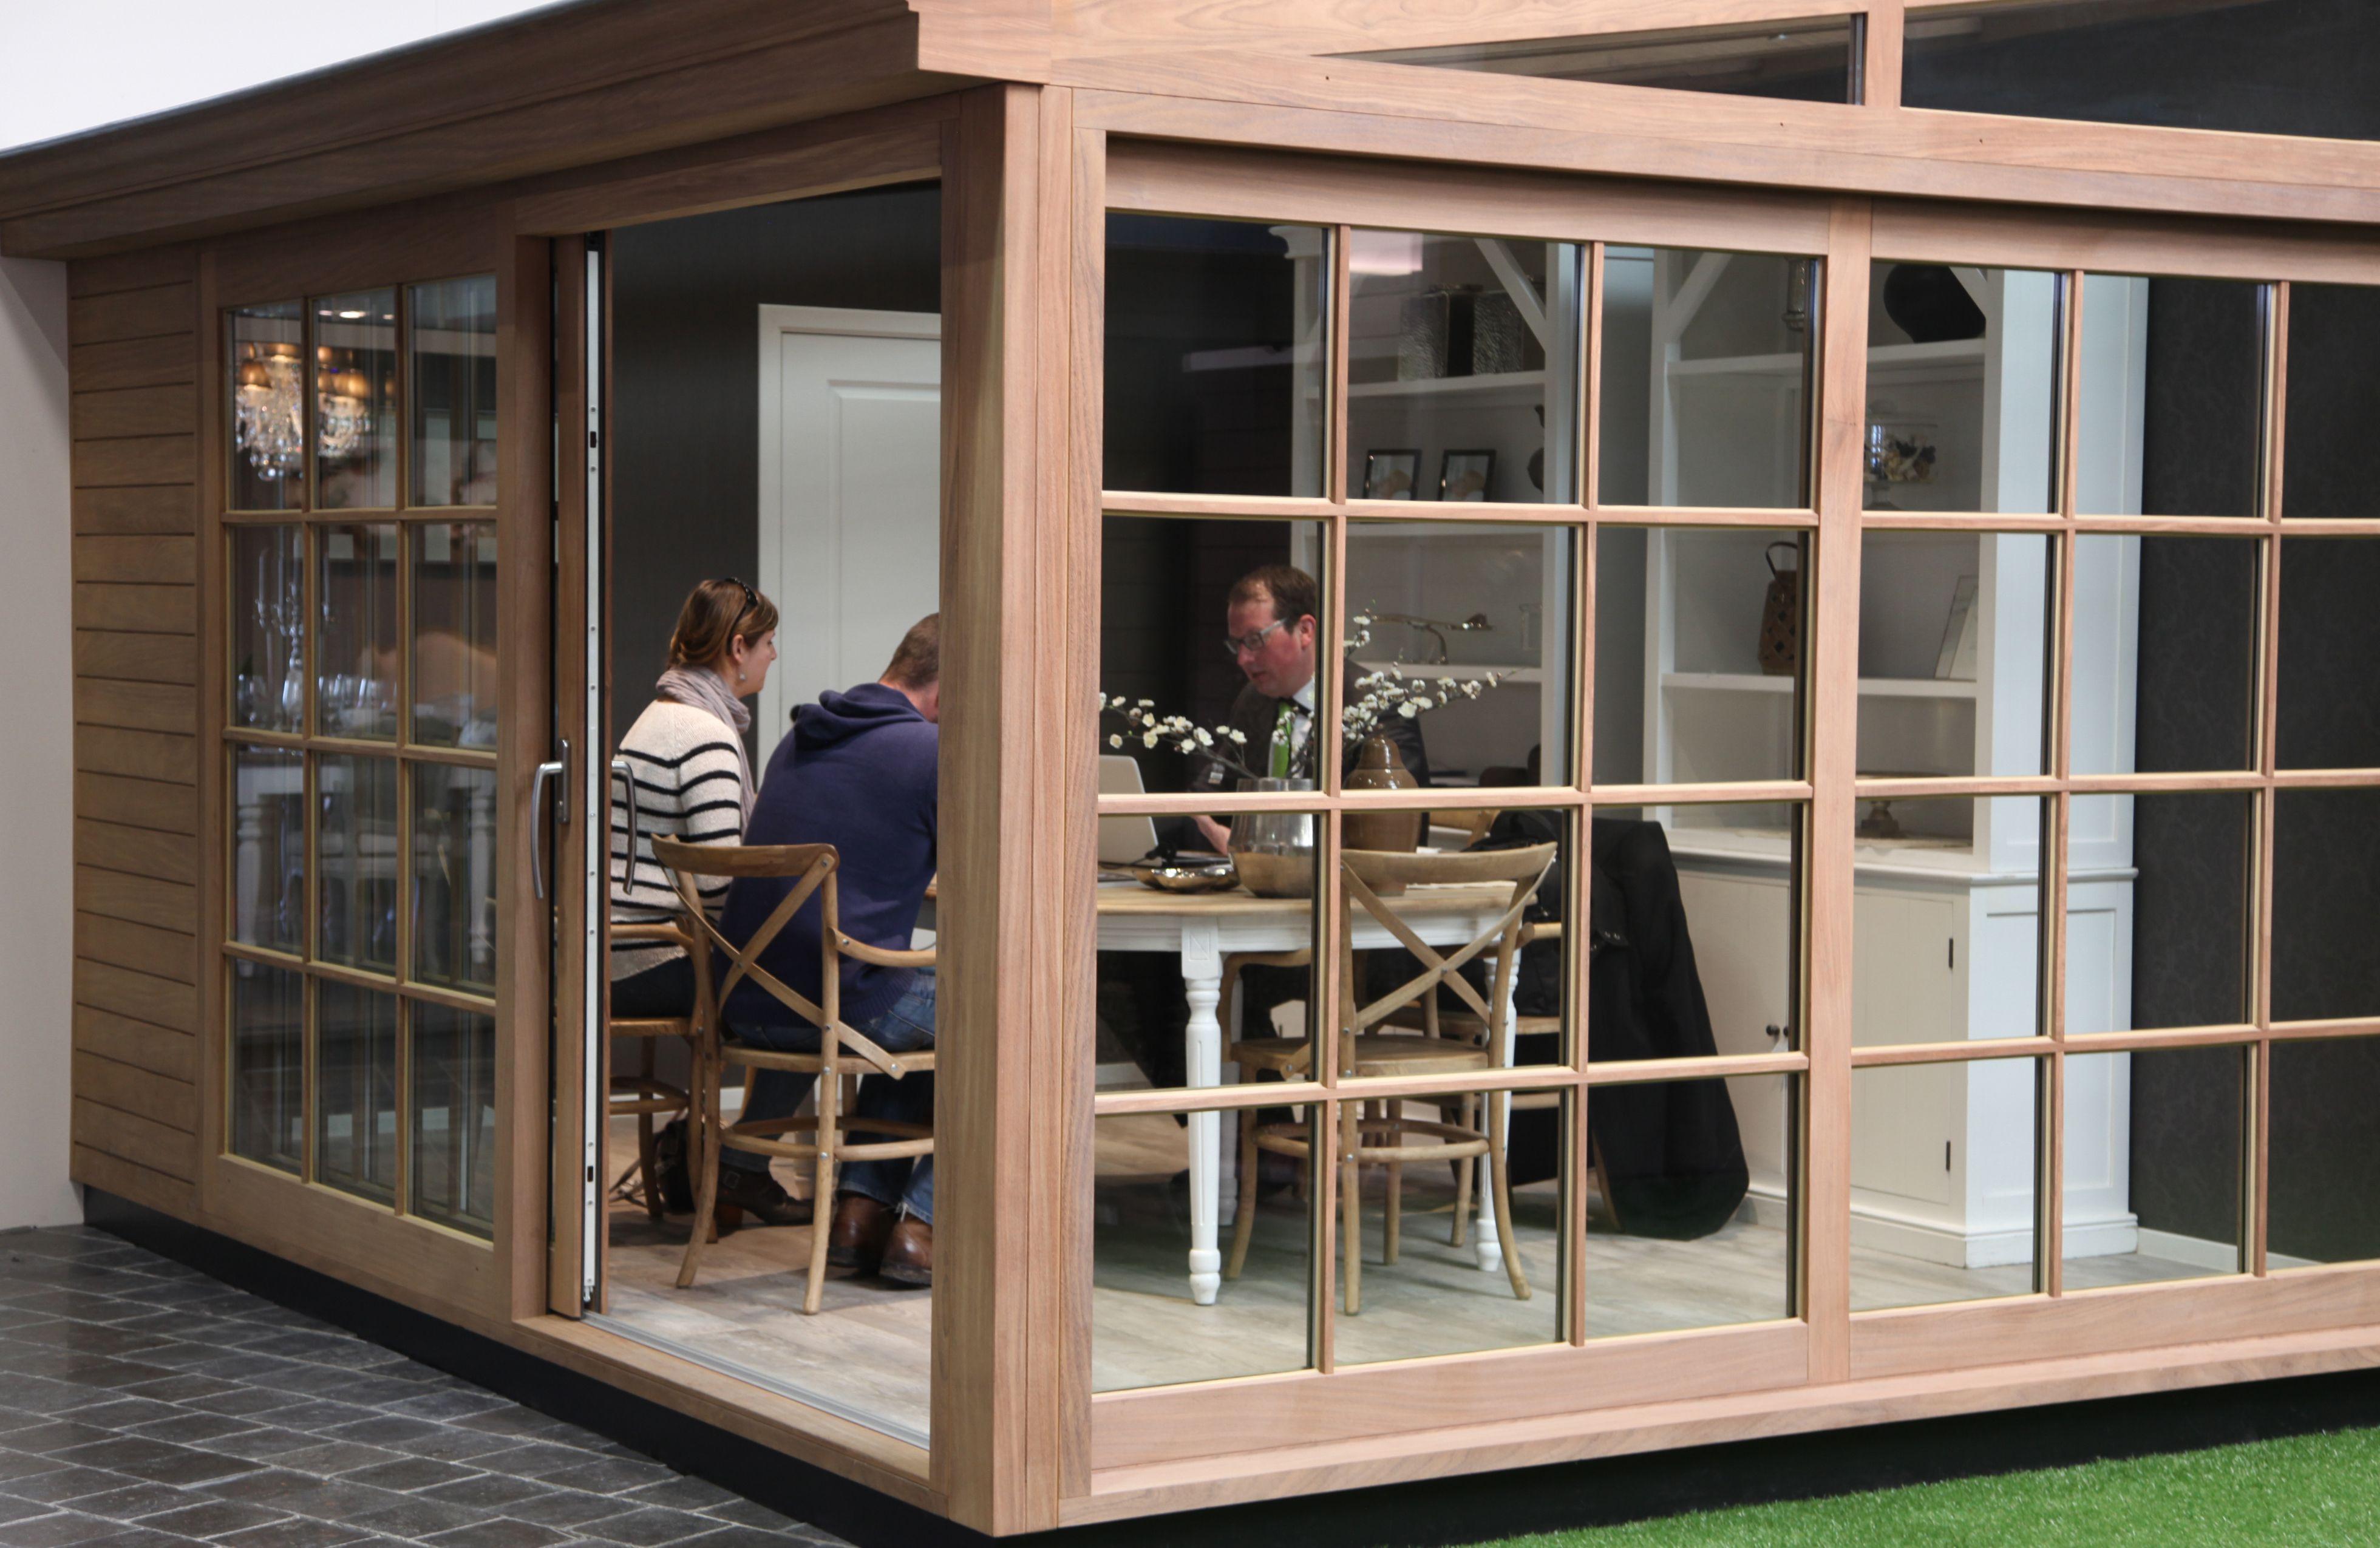 Abri Veranda Pour Spa houten veranda met kleinhouten ramen - véranda en bois avec